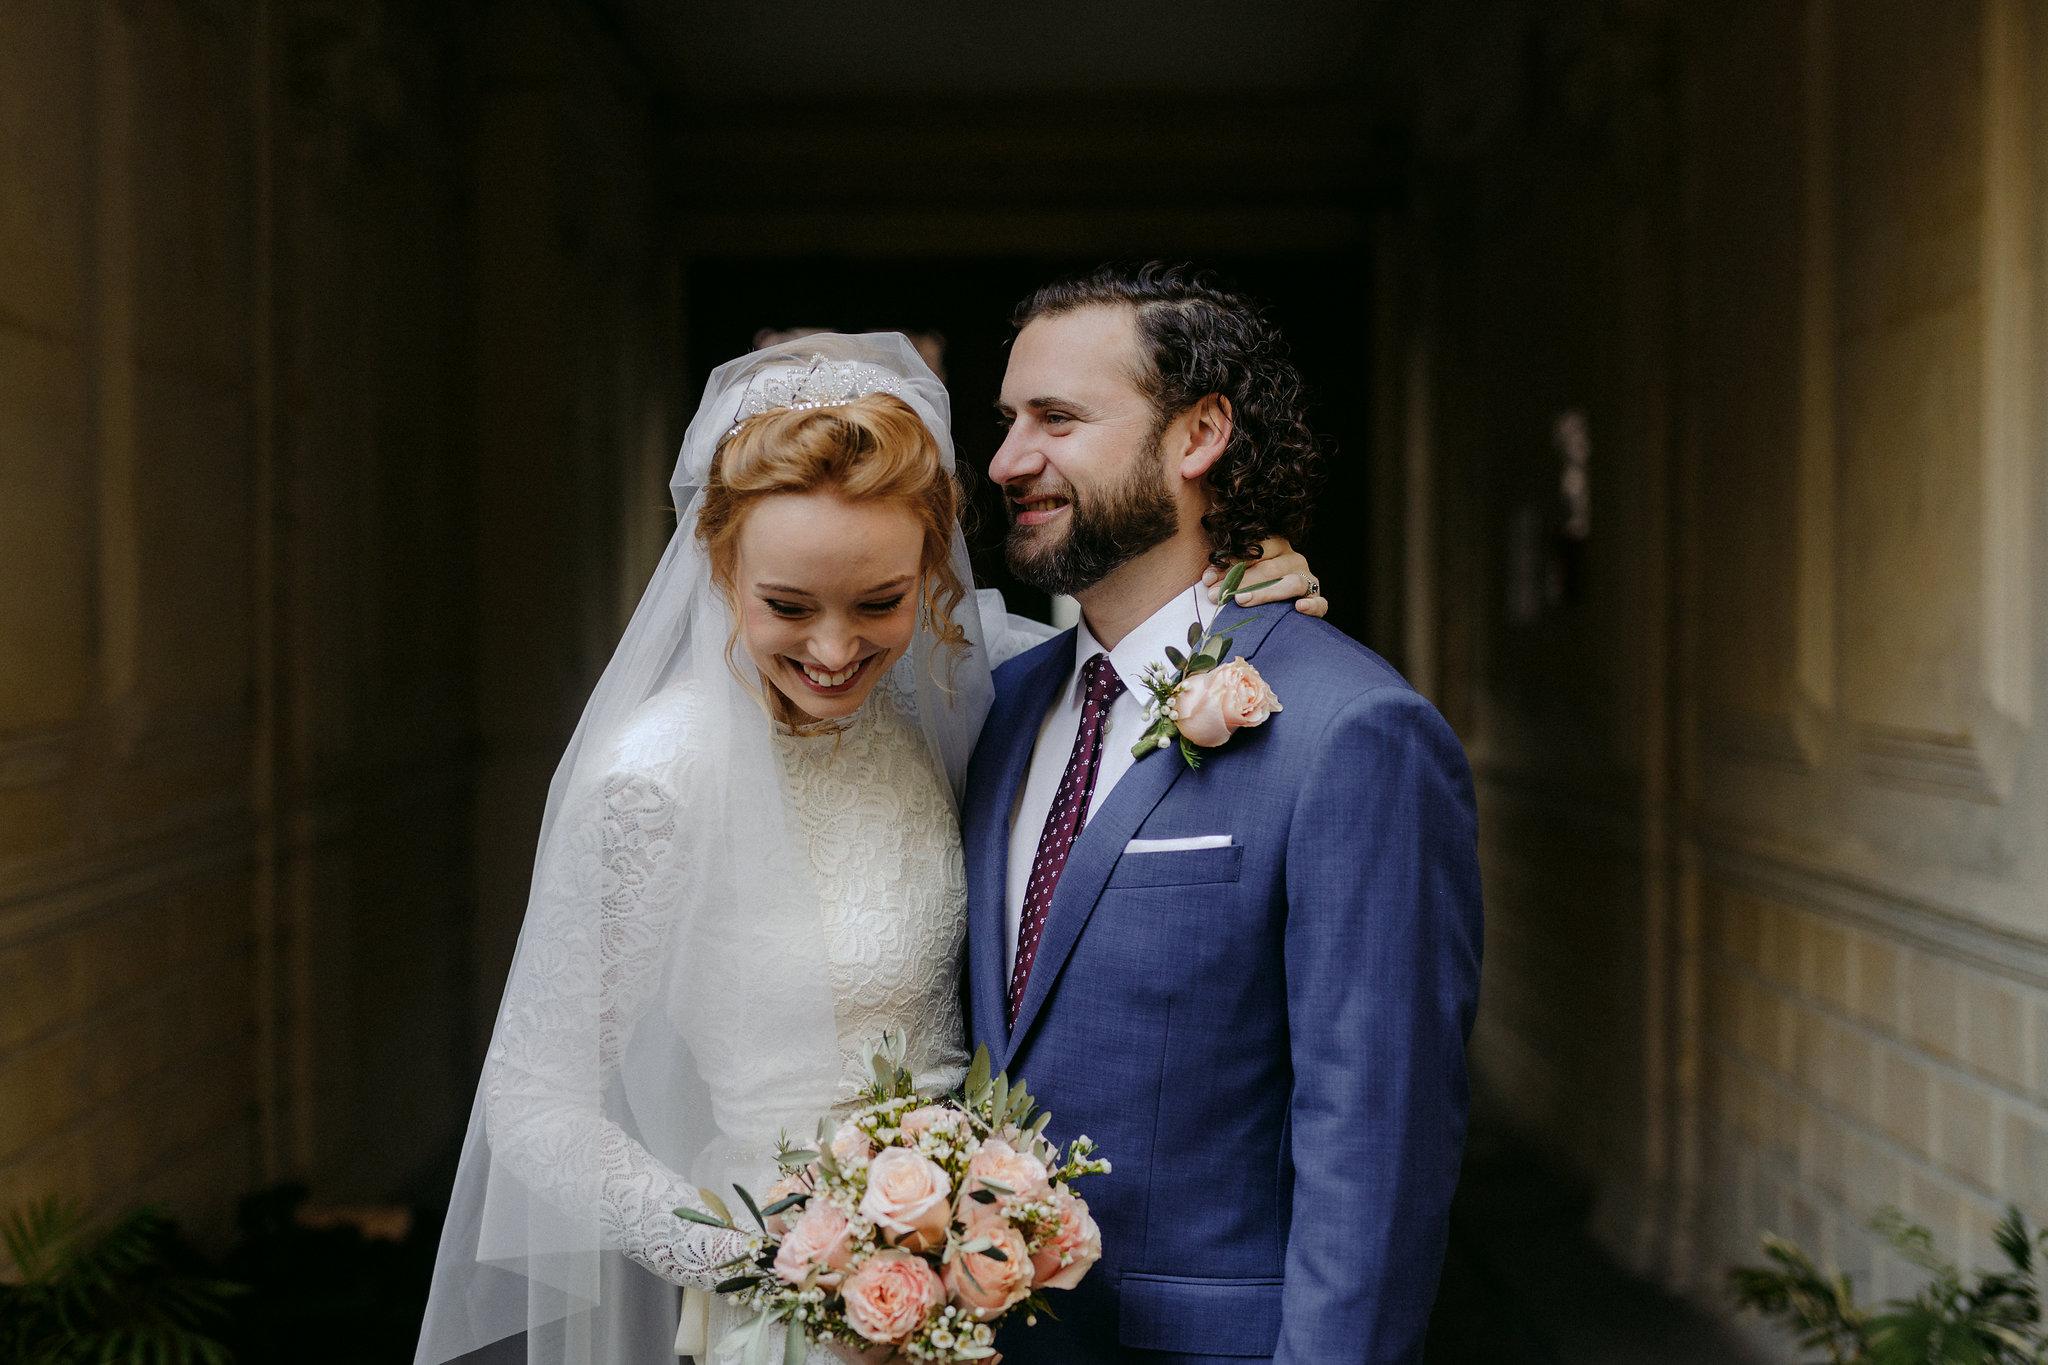 Paris_elopement_wedding_photographer-78.jpg